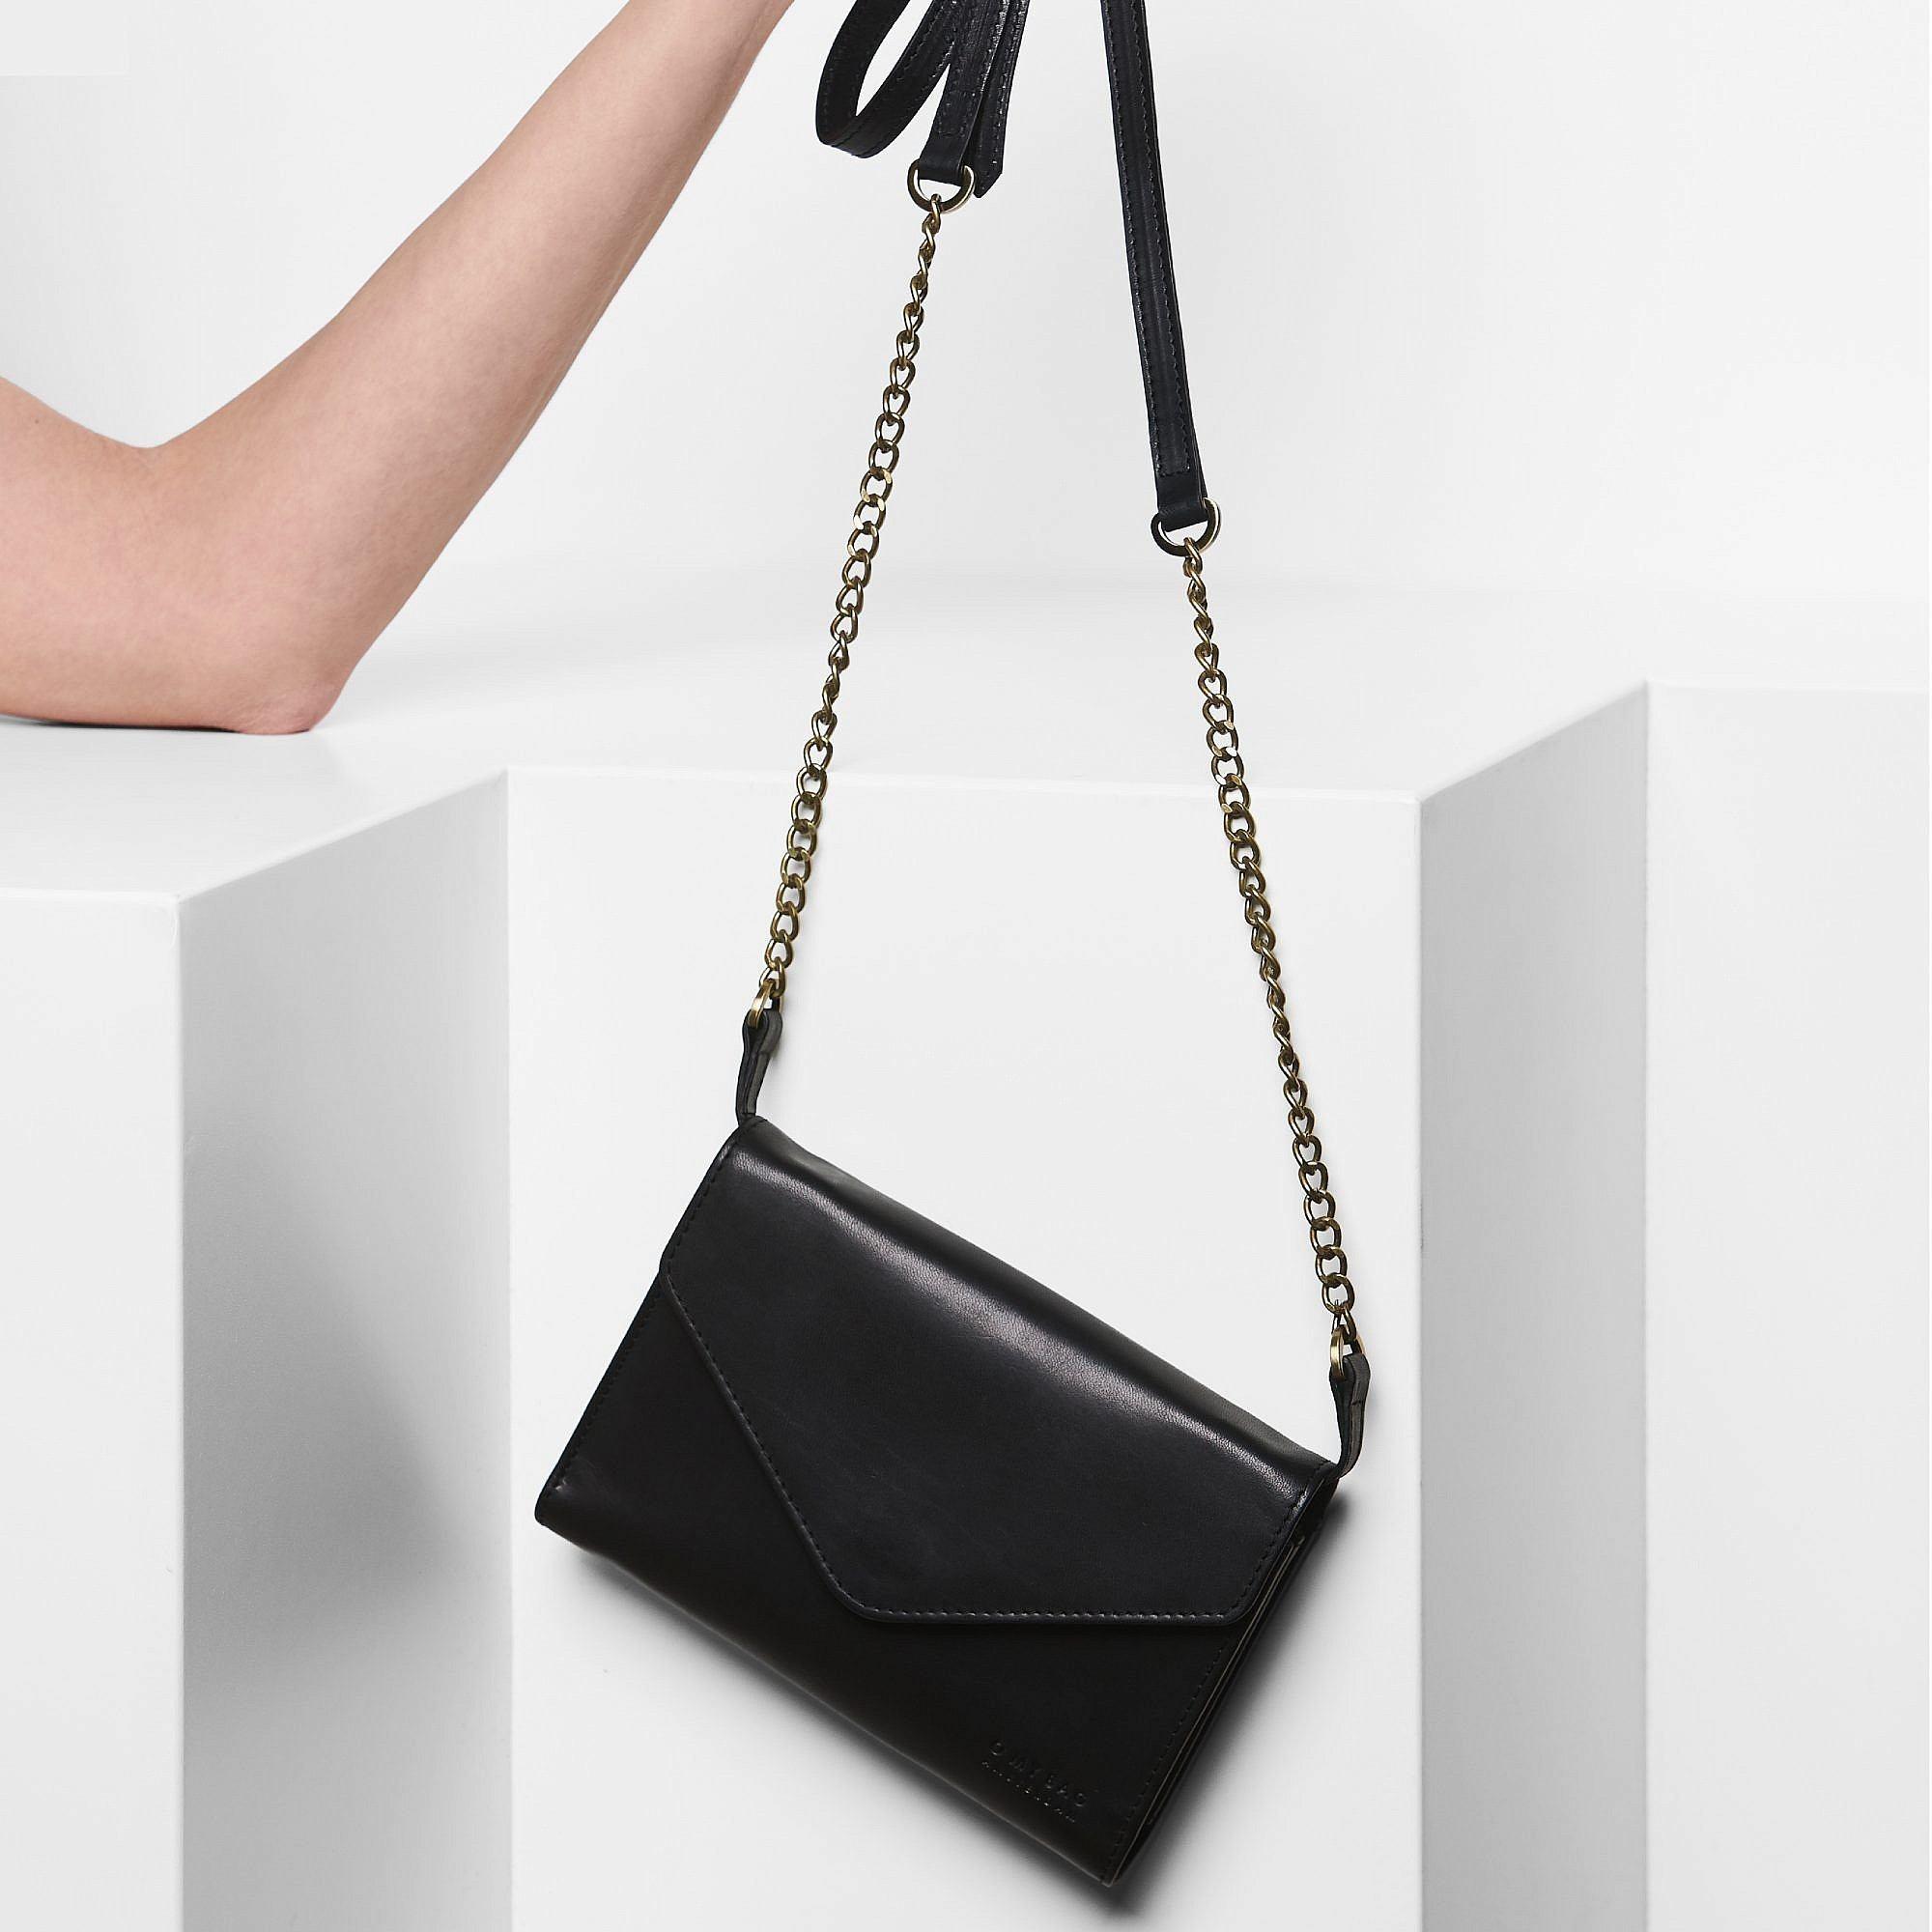 Josephine Chain Bag - Black Classic Leather-7